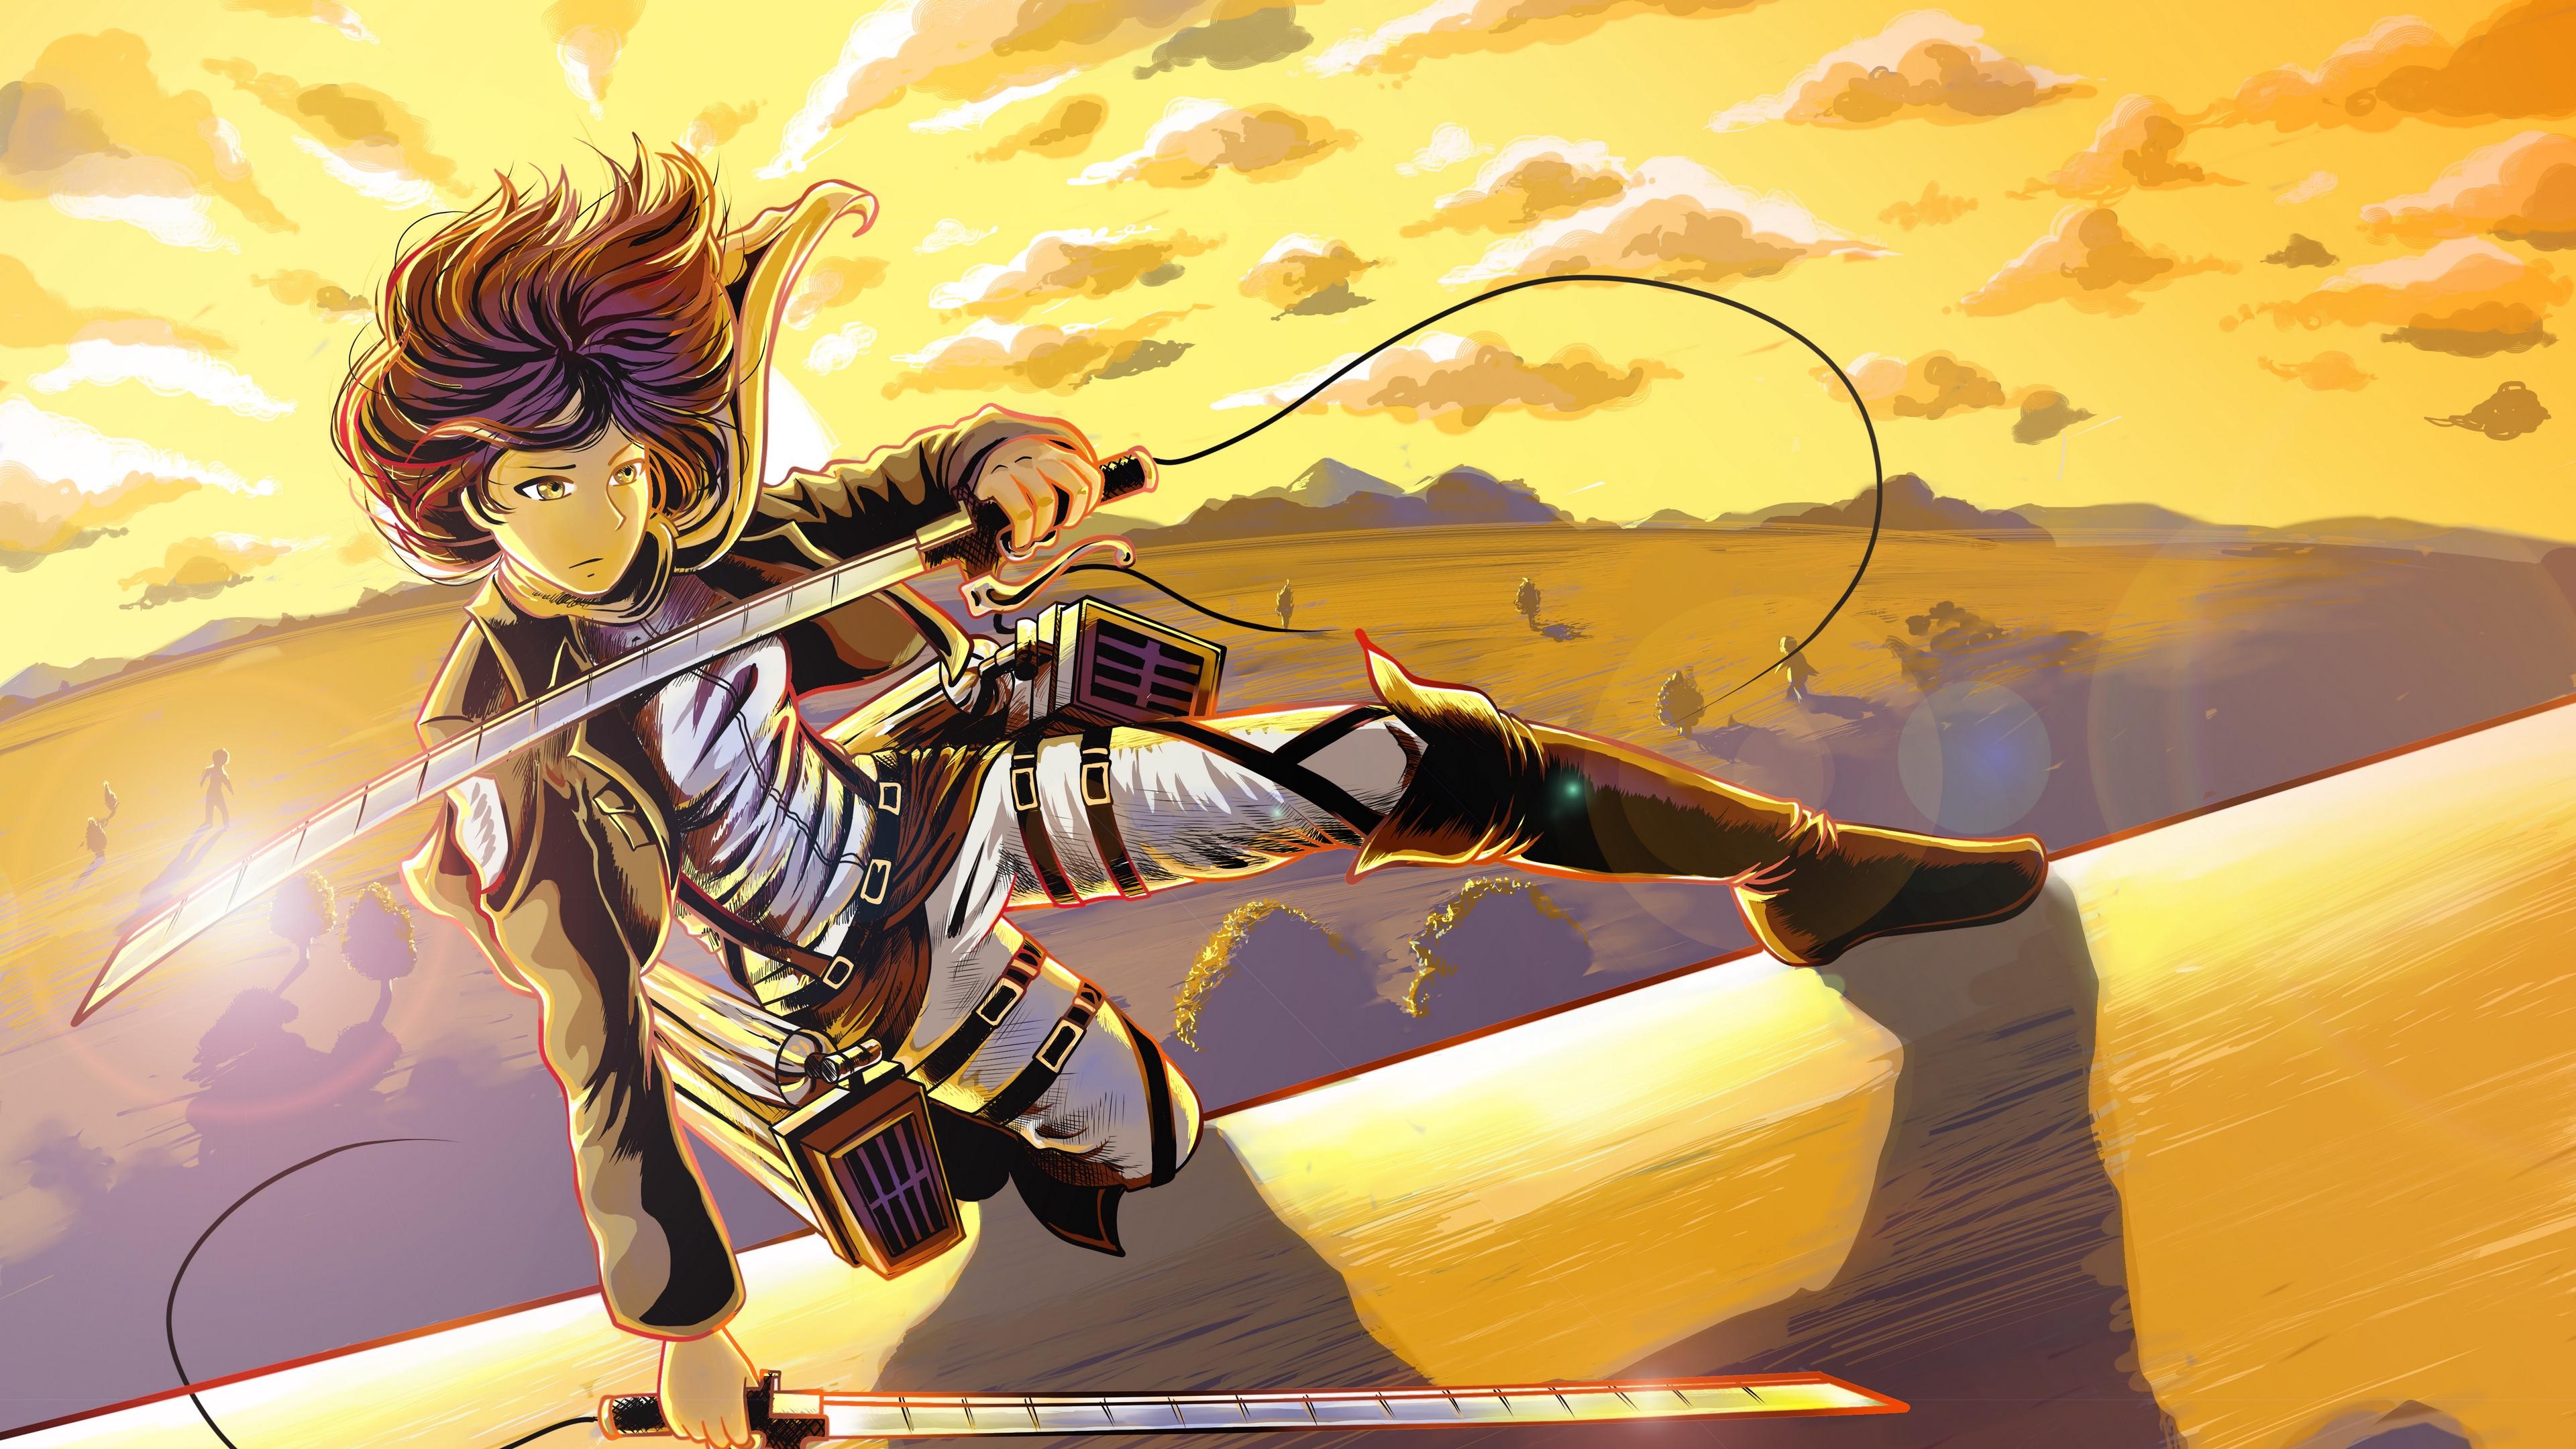 Wallpaper 4k Luna Selenium Mikasa Ackerman Shingeki No Kyojin